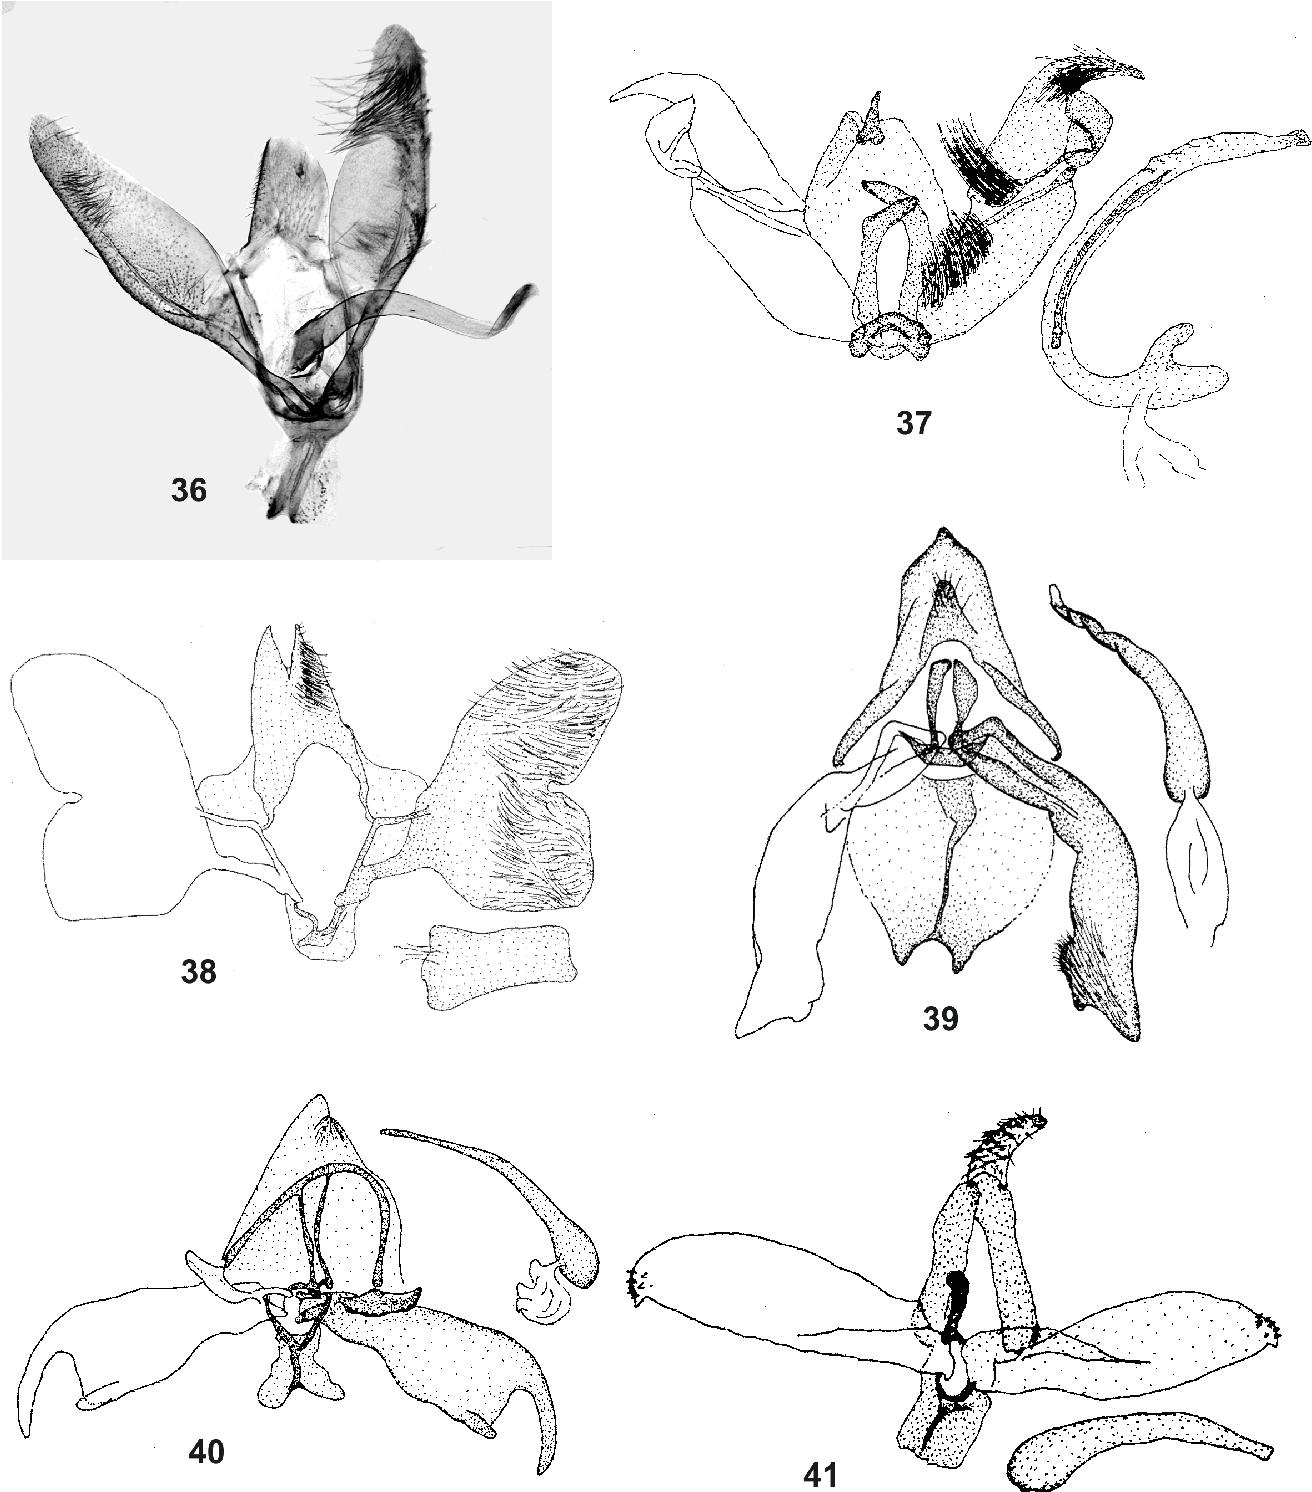 figure 36-41